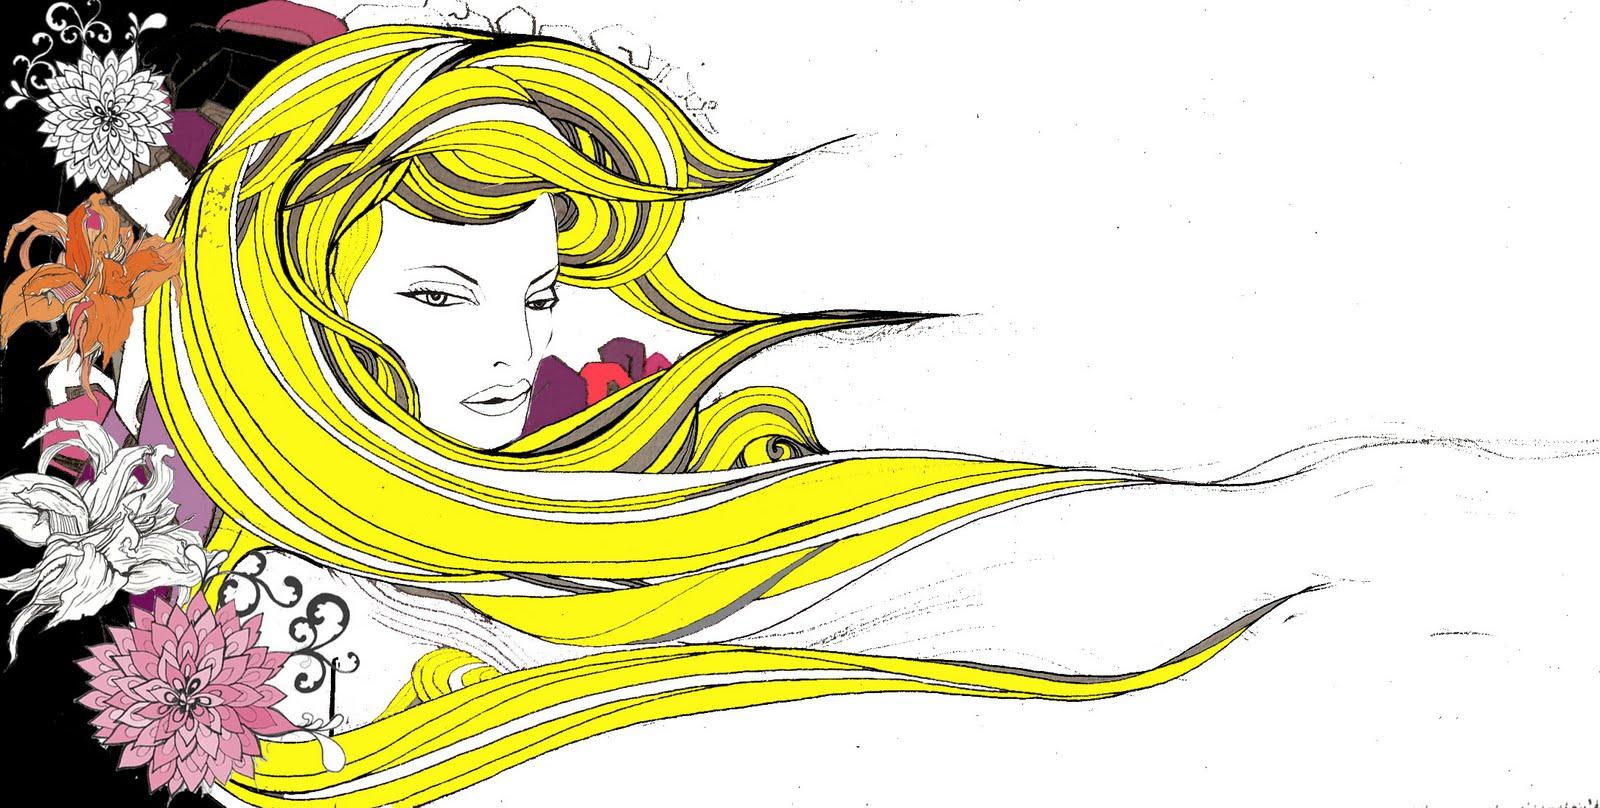 [yellowhead4.jpg]